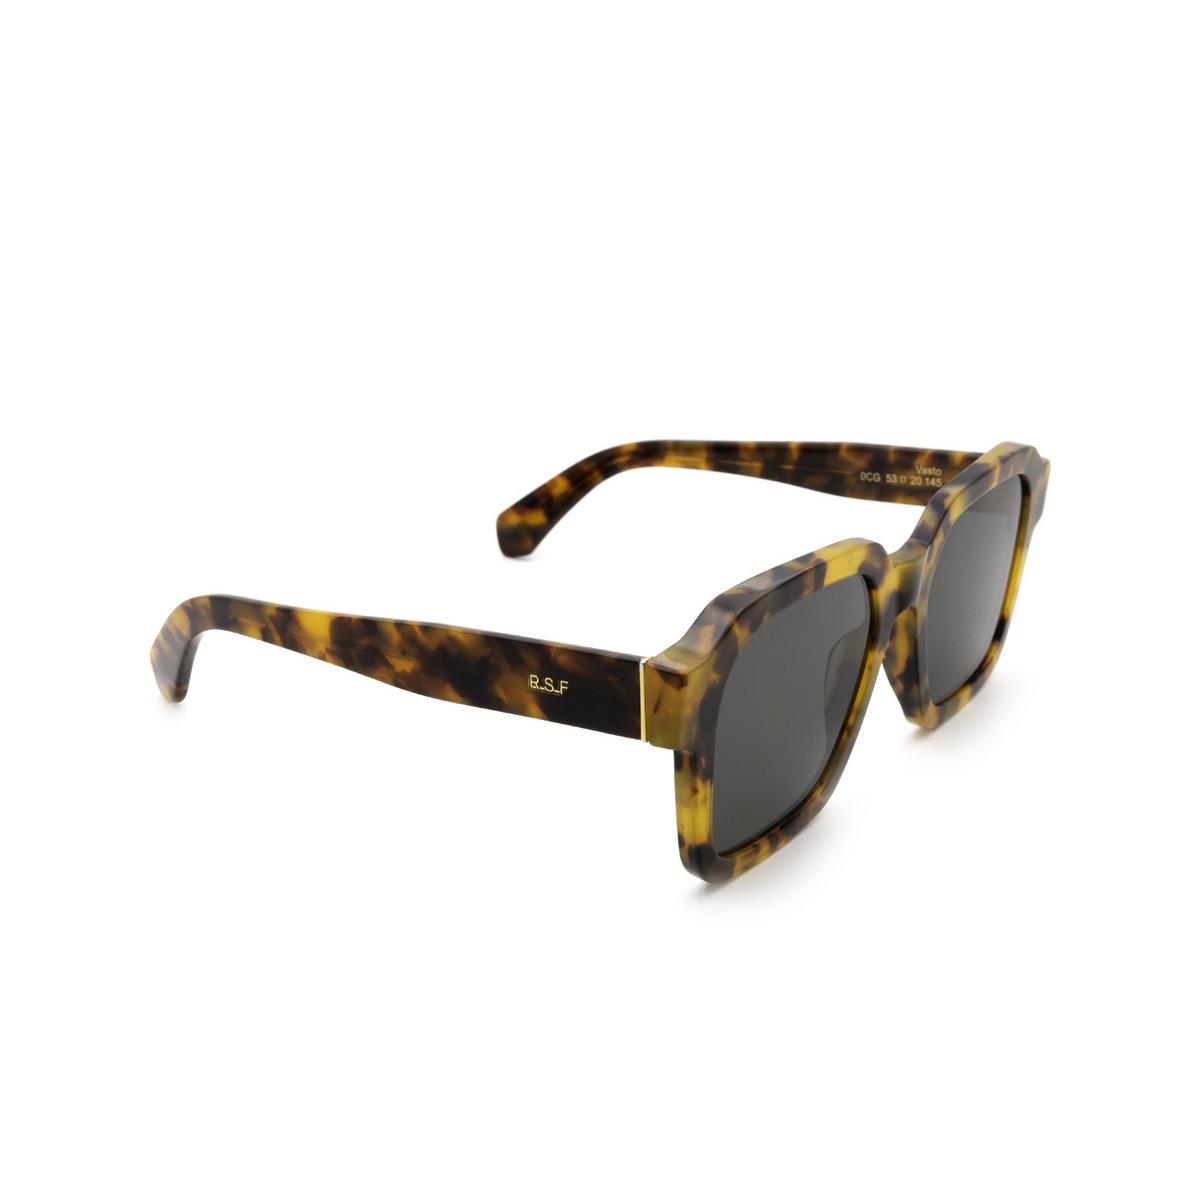 Retrosuperfuture® Square Sunglasses: Vasto color Spotted Havana 0CG - three-quarters view.